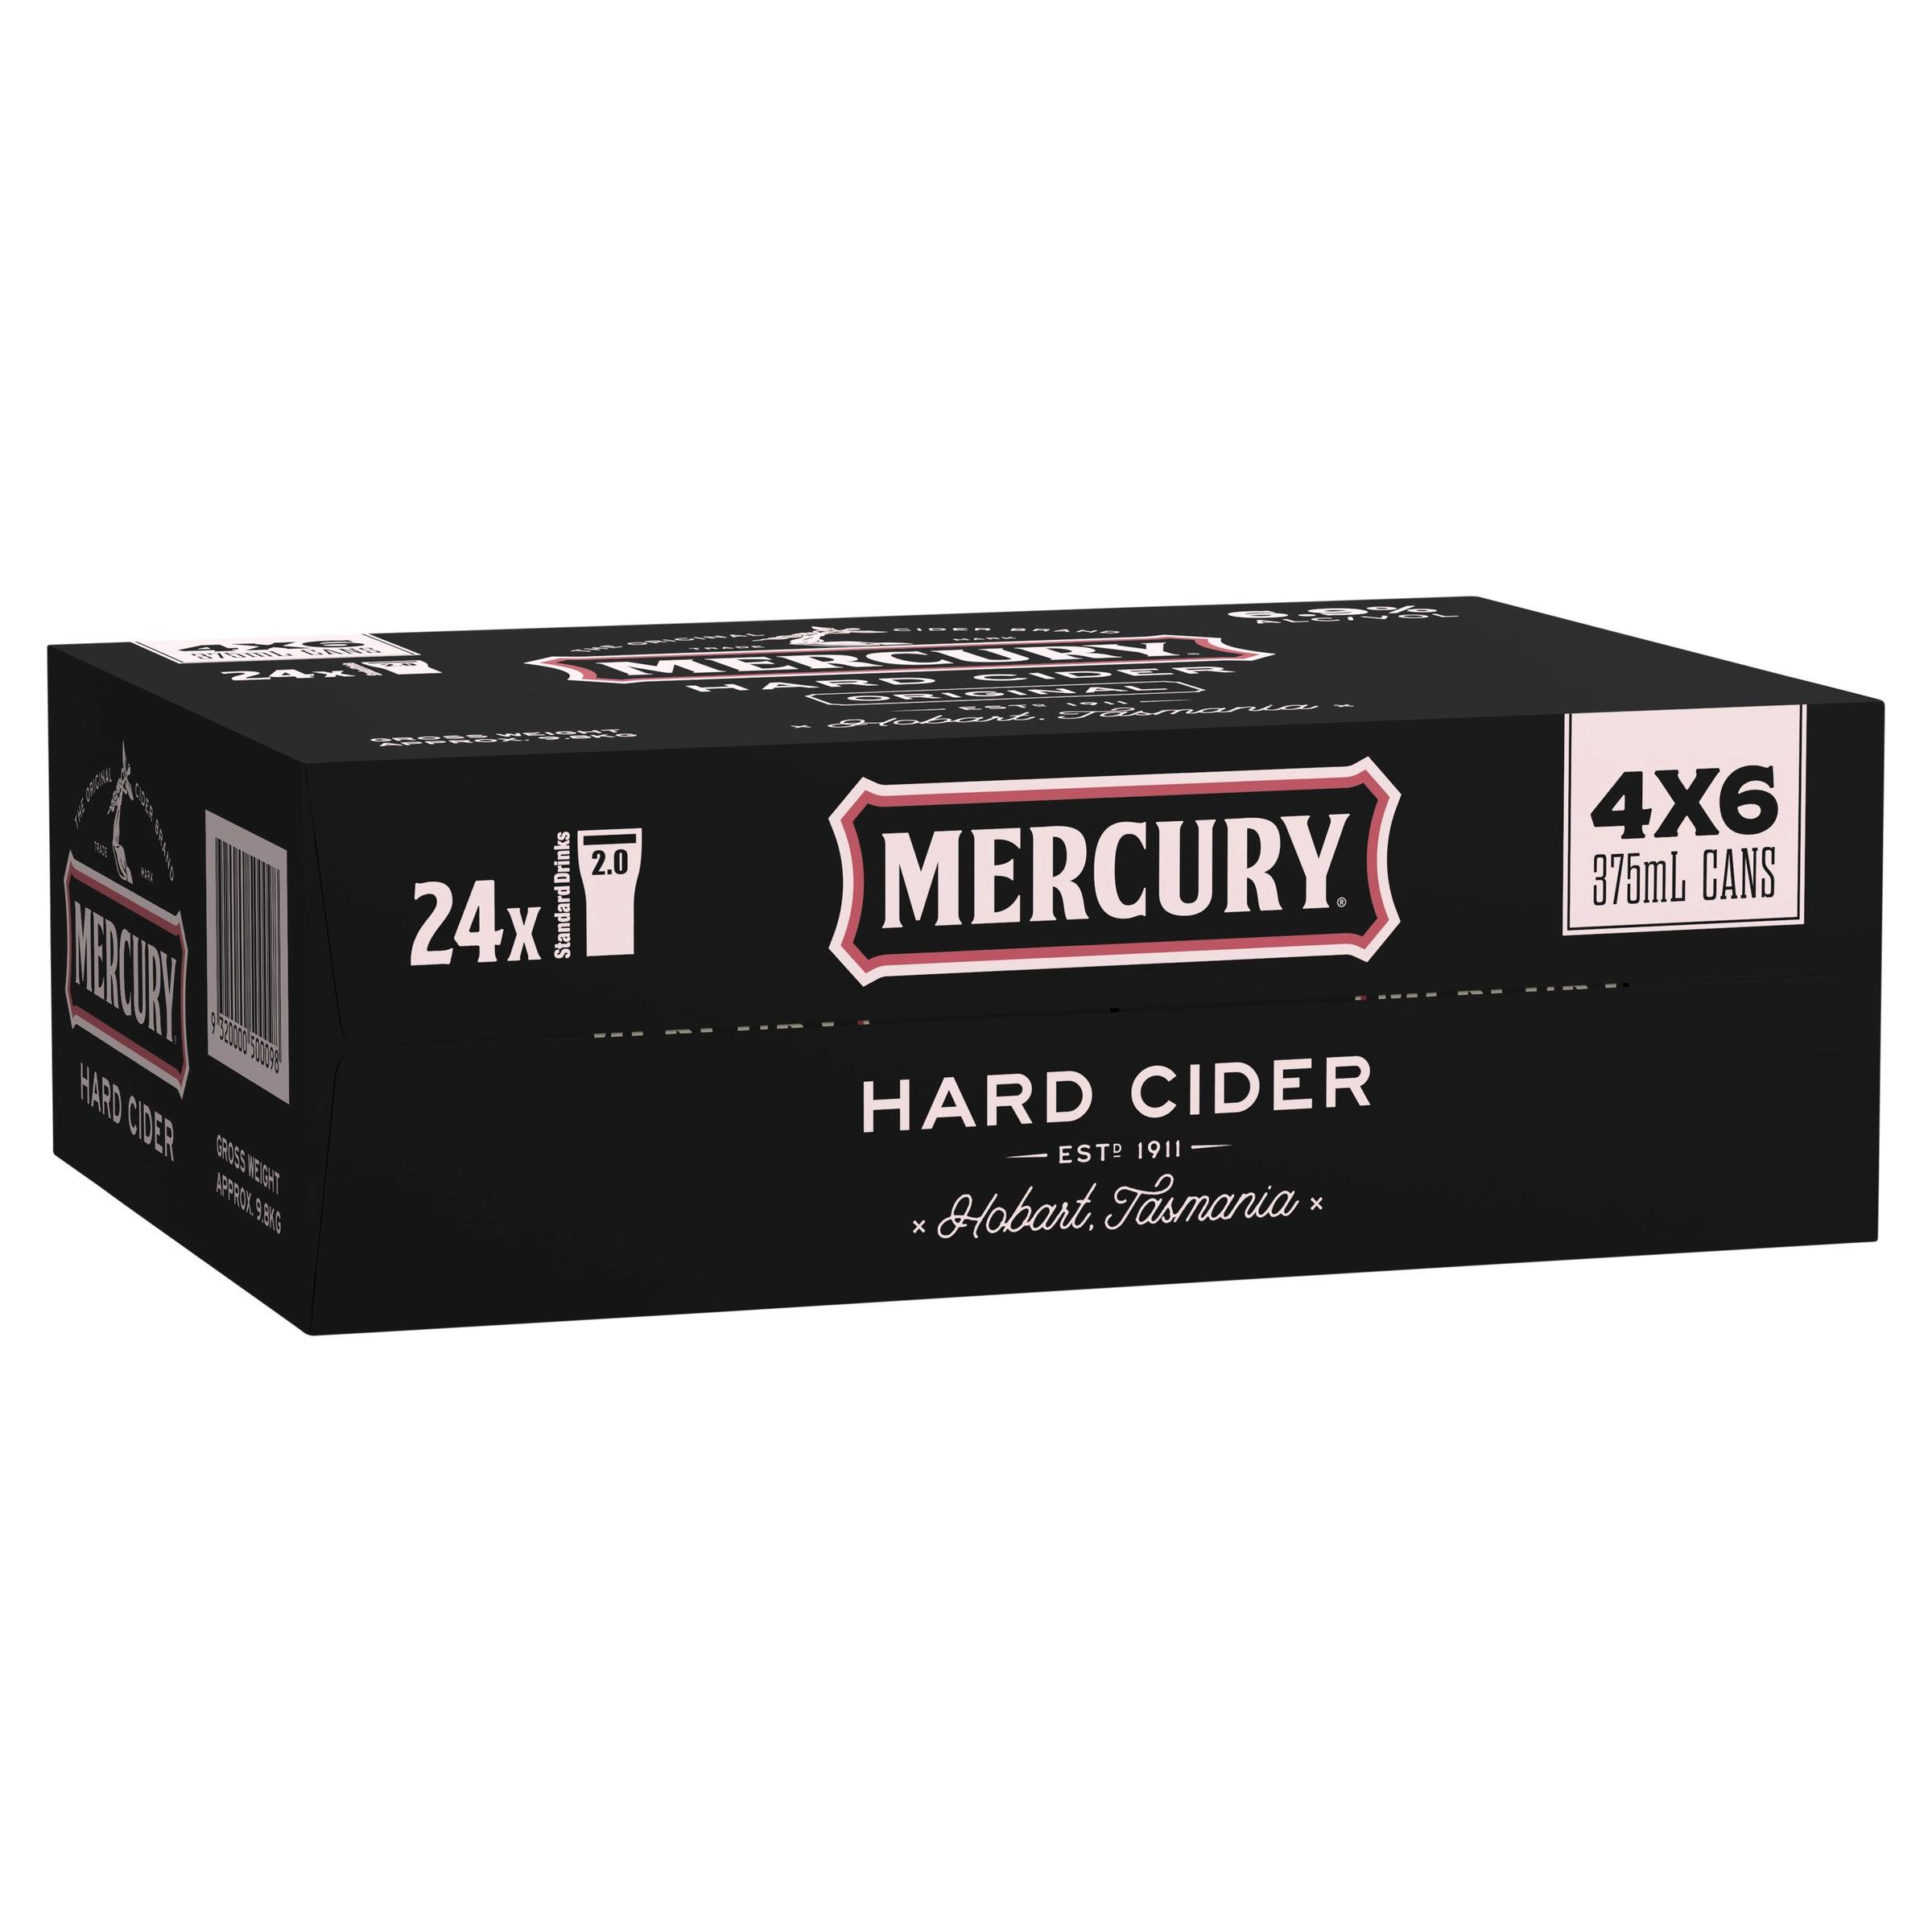 Mercury Hard Cider Case 24 x 375mL Cans